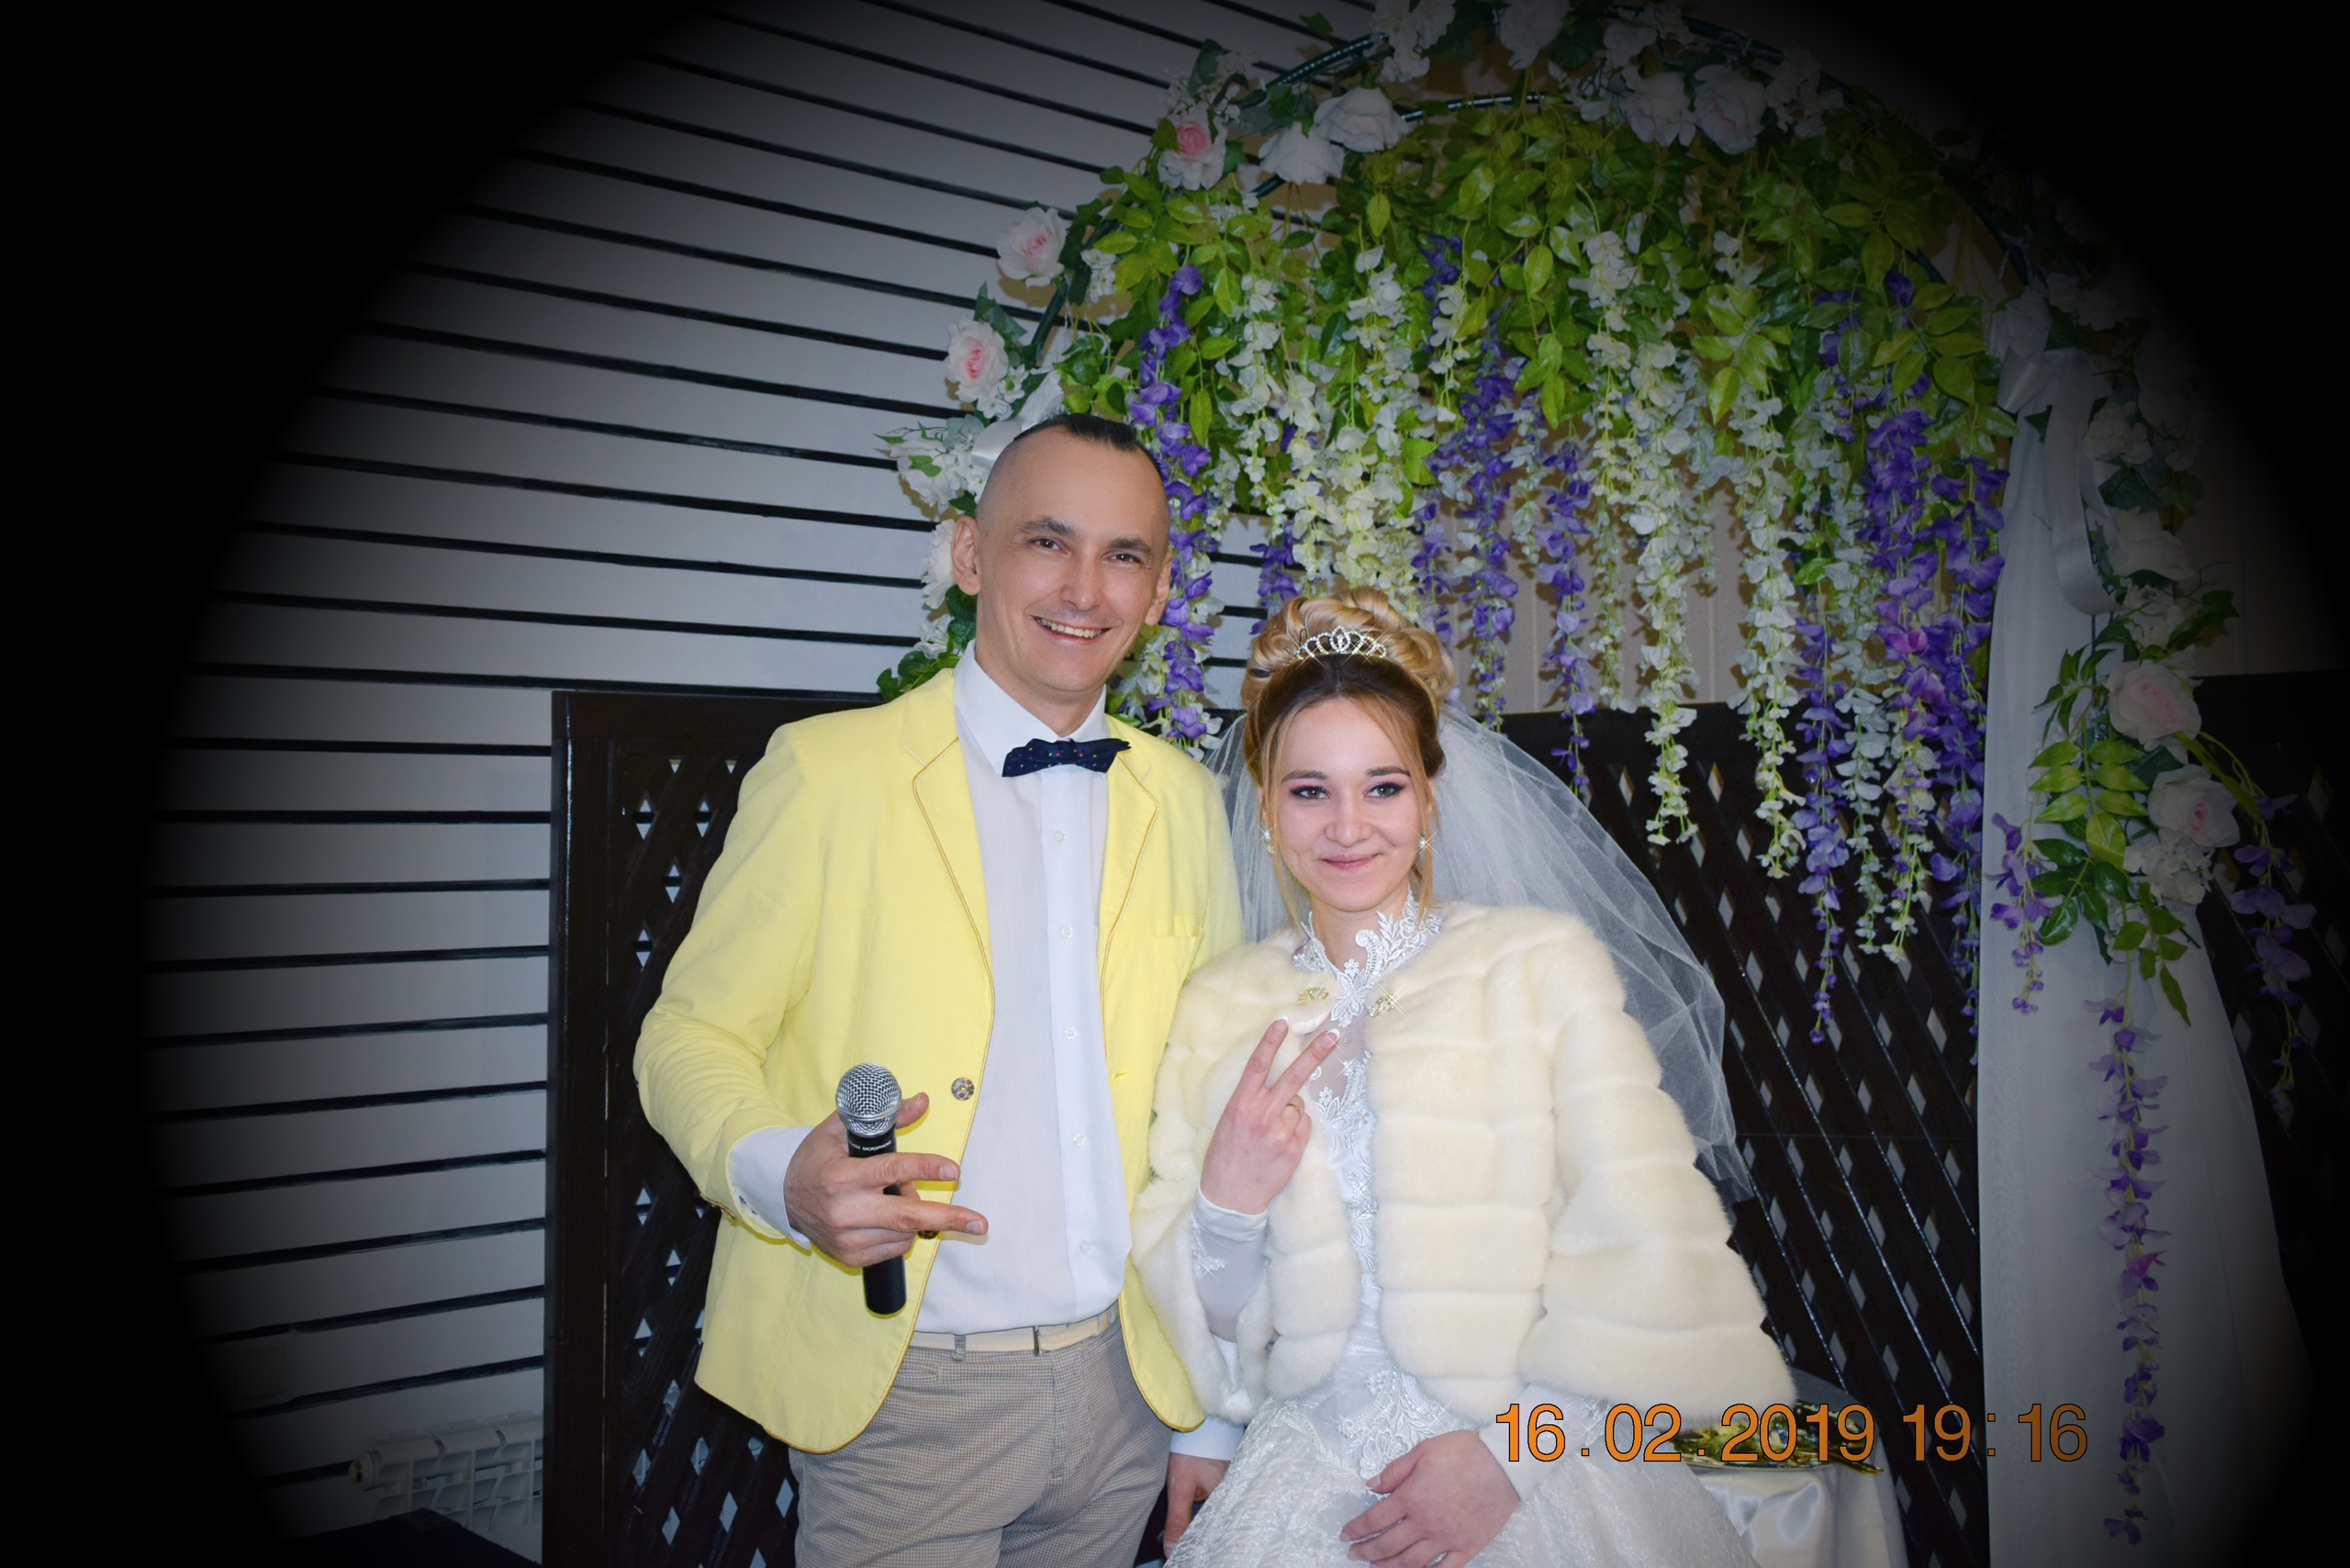 dYrGjipftk0 - Свадьба Николая и Елены